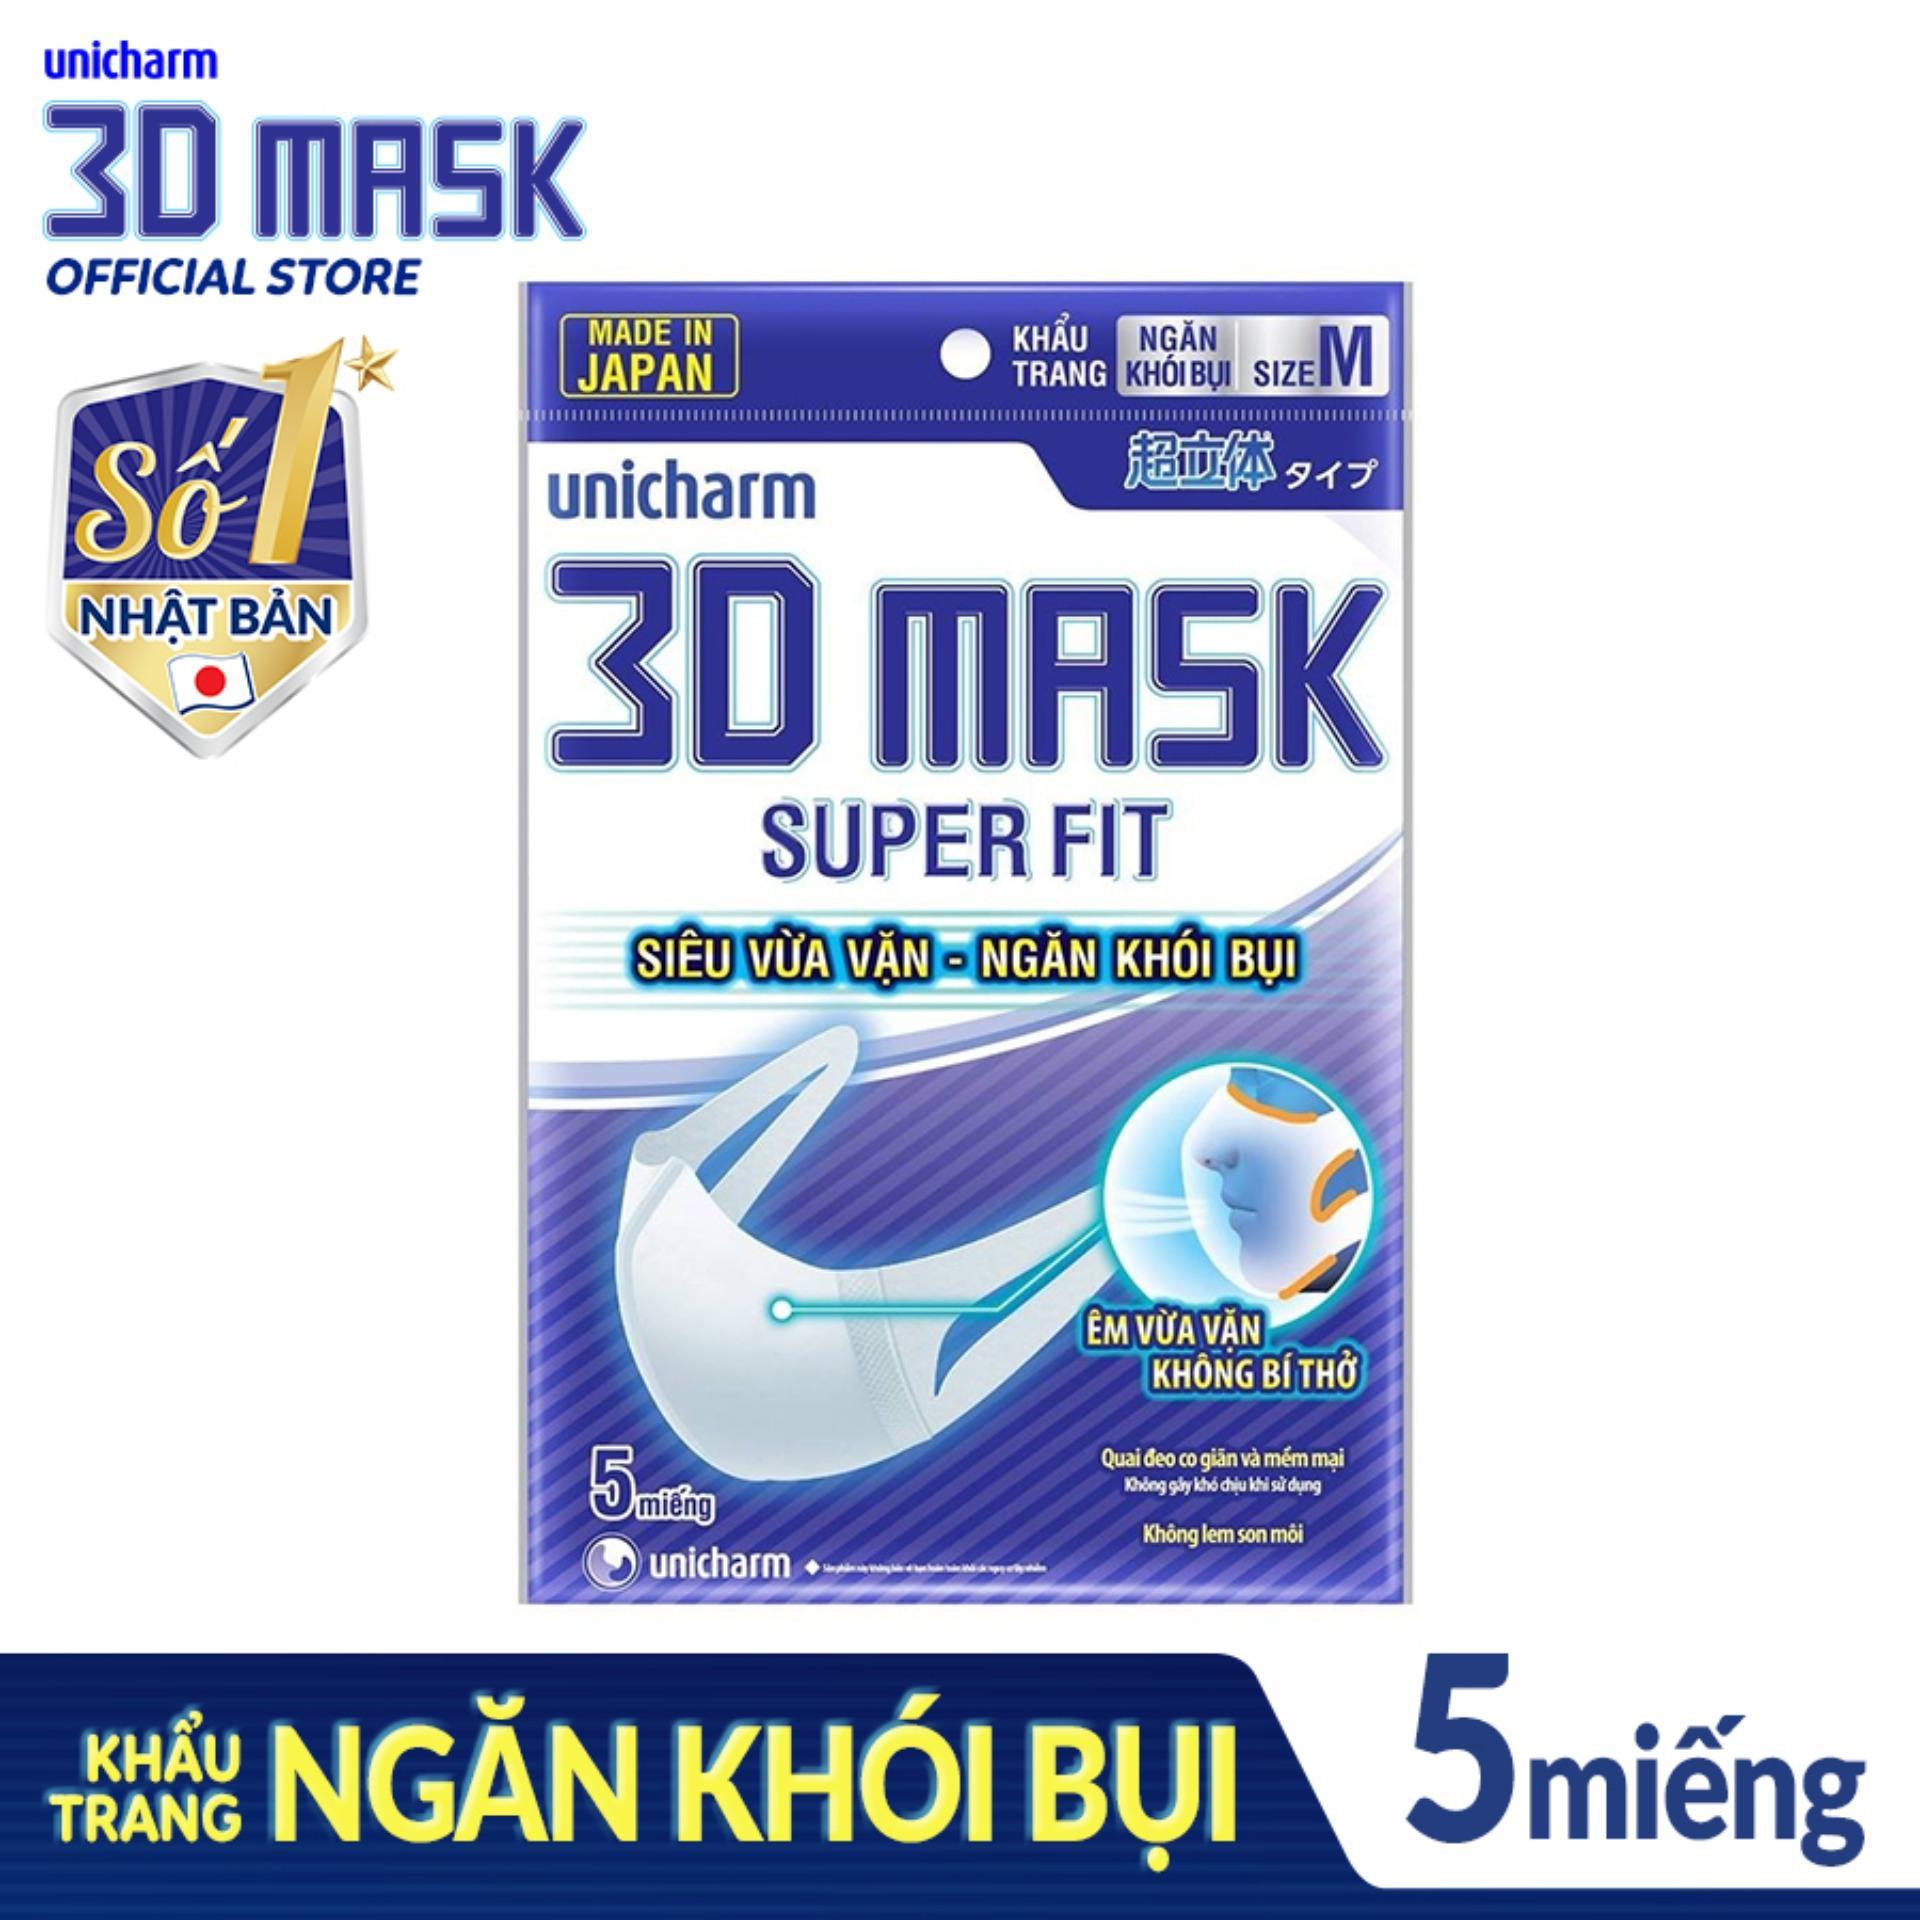 Khẩu trang ngăn khói bụi Unicharm 3D Mask Super Fit size M gói 5 miếng